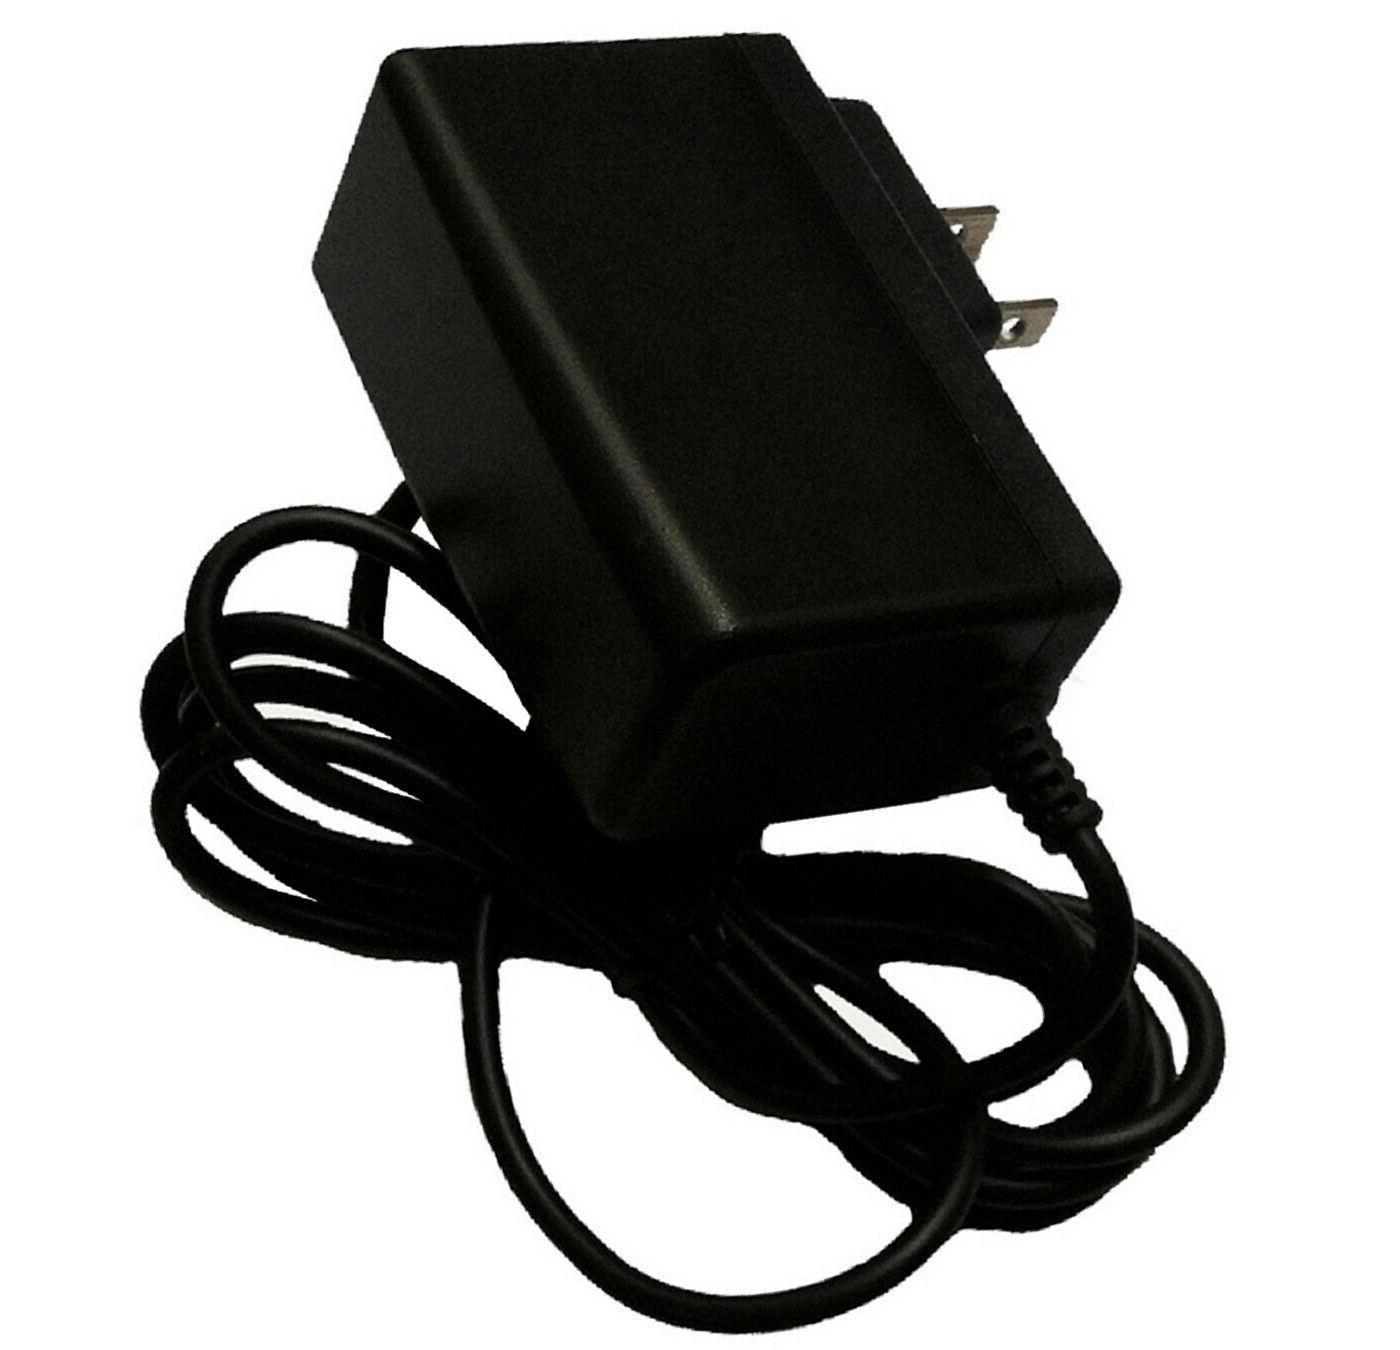 9V AC Adapter For Sennheiser Digital Wireless DC Supply